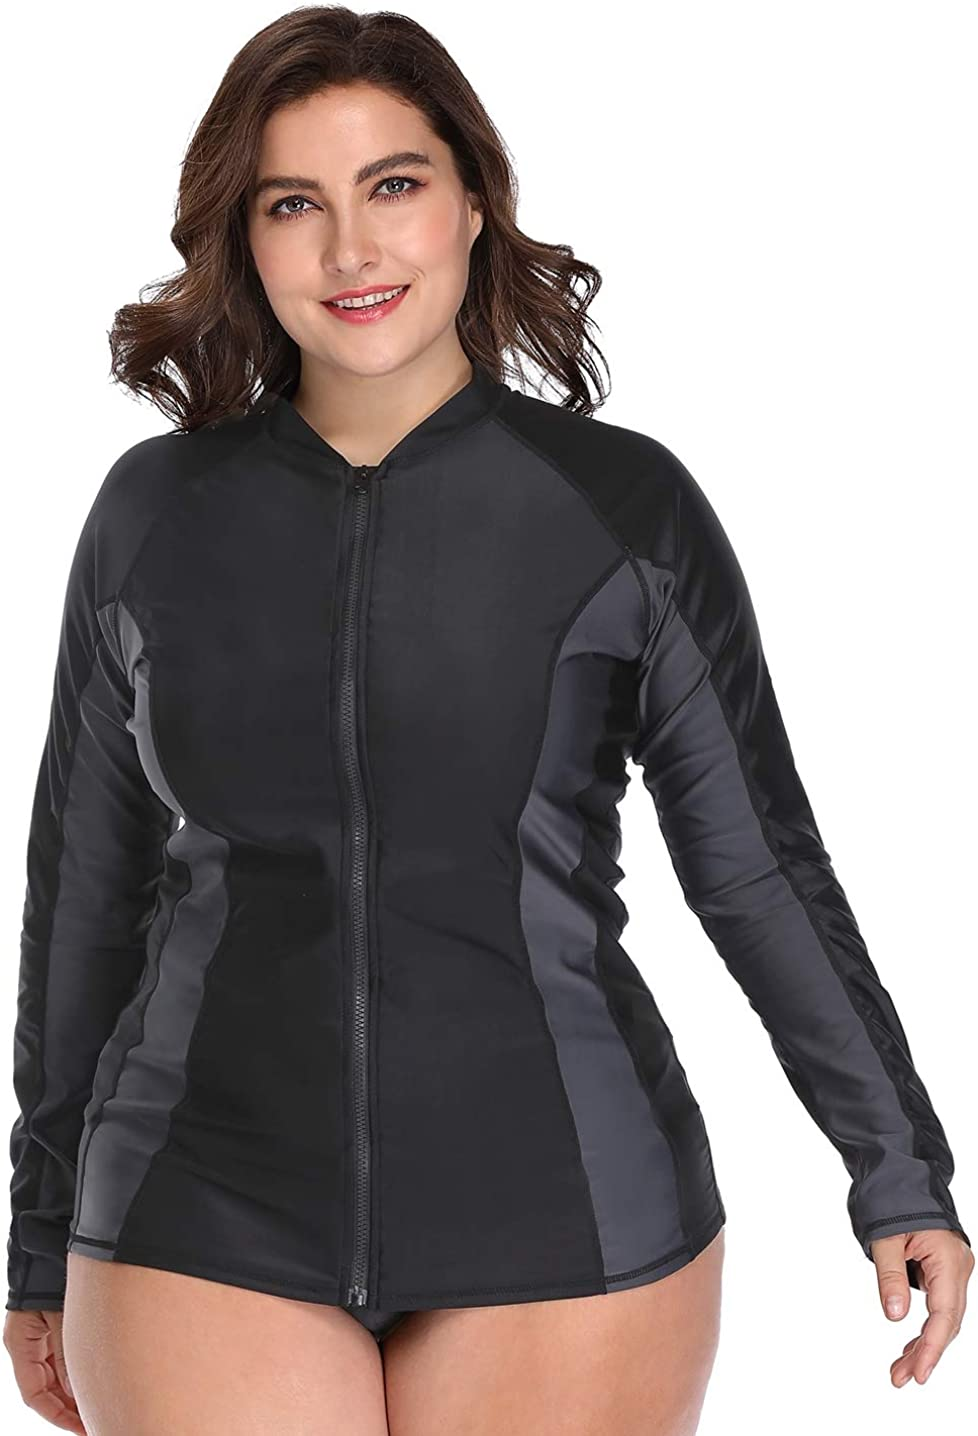 ATTRACO Womens Plus Size Long Sleeve Rash Guard Top Zipper Swimsuit Swim Shirt